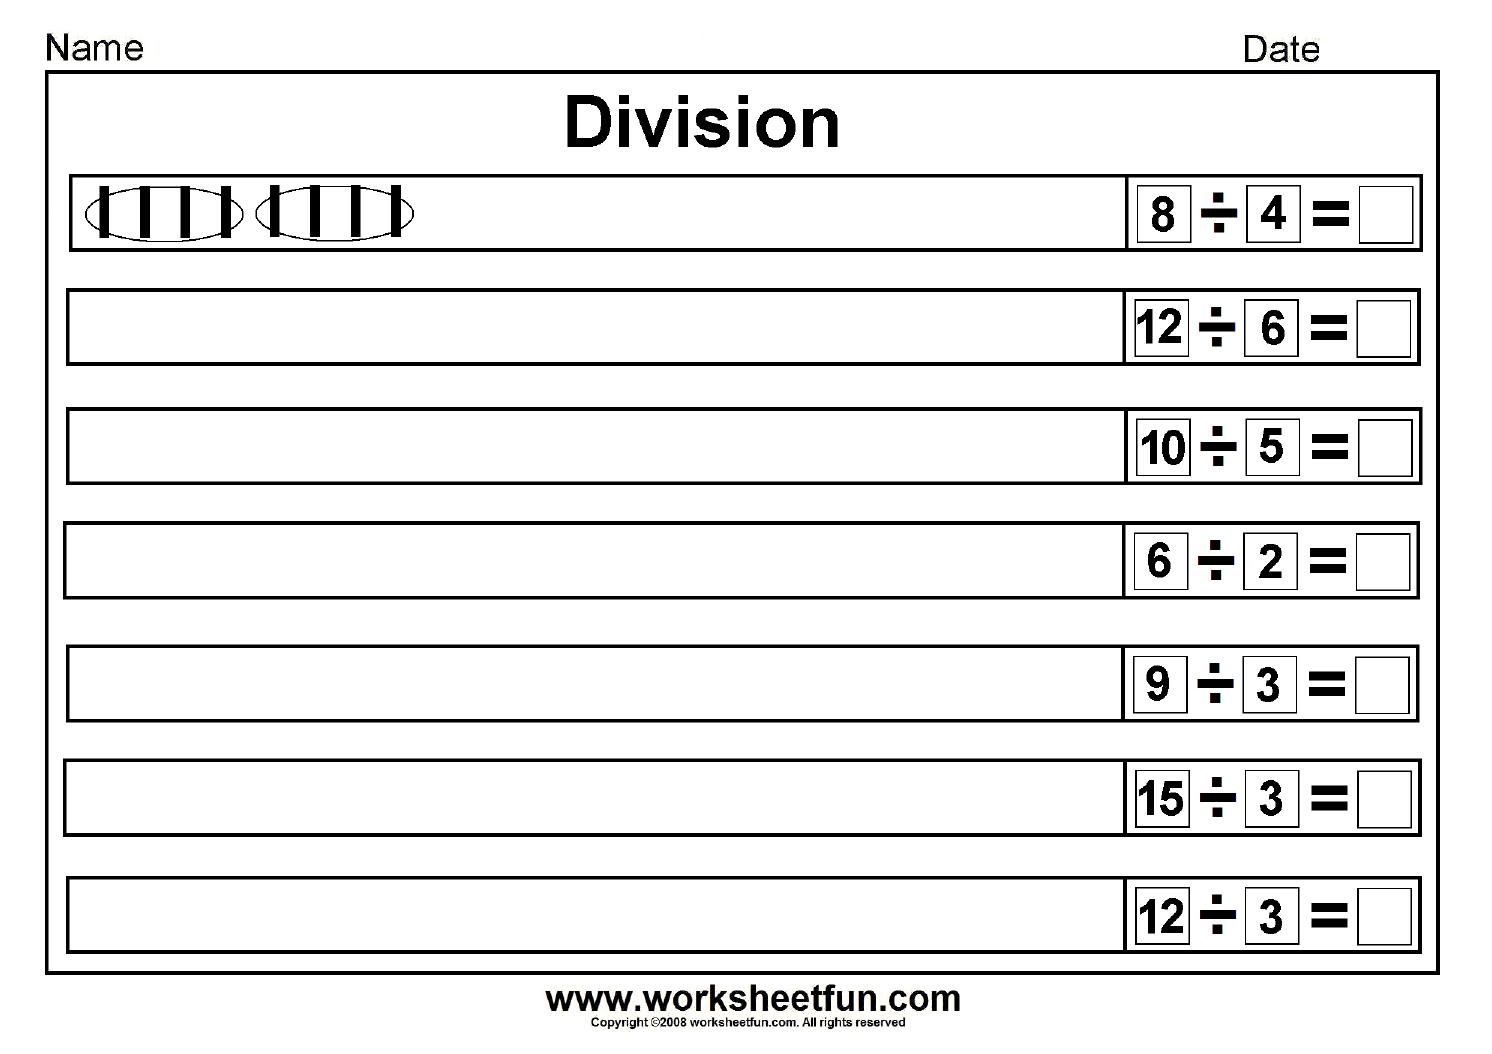 Division Draw Lines Worksheet 1 1 492 1 054 Pixels